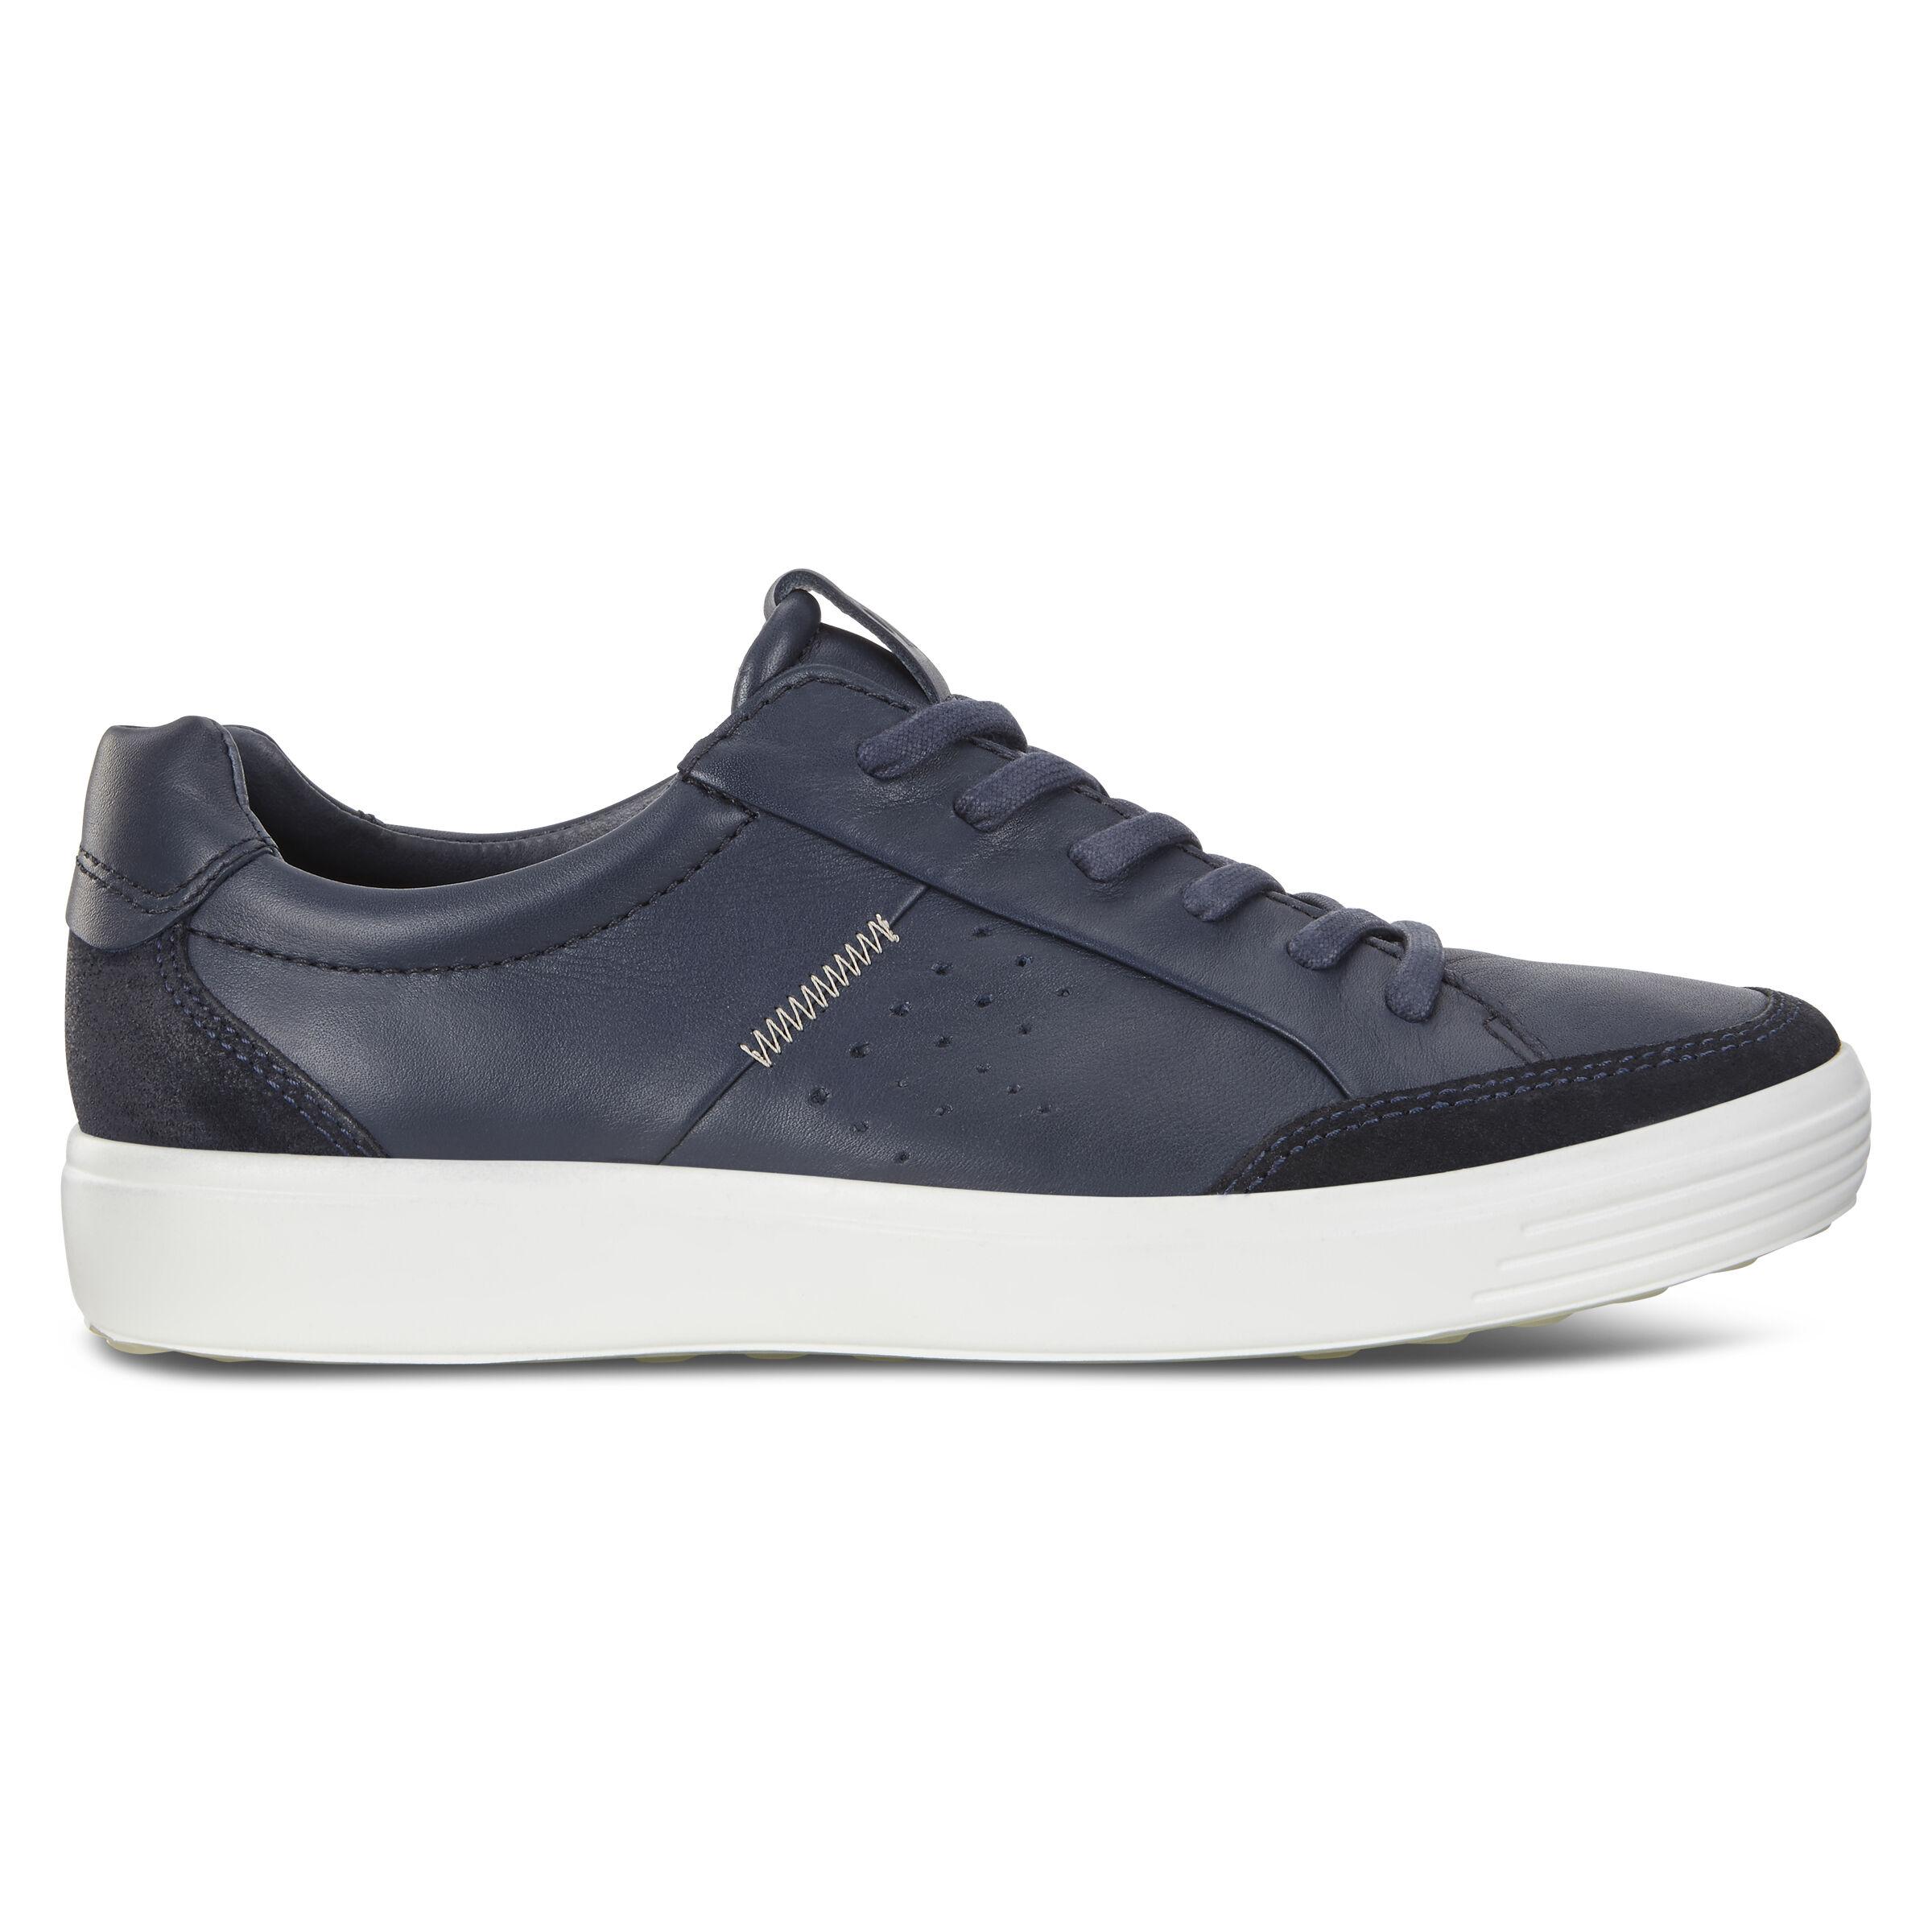 ECCO Soft 7 Sneaker | Men's Casual